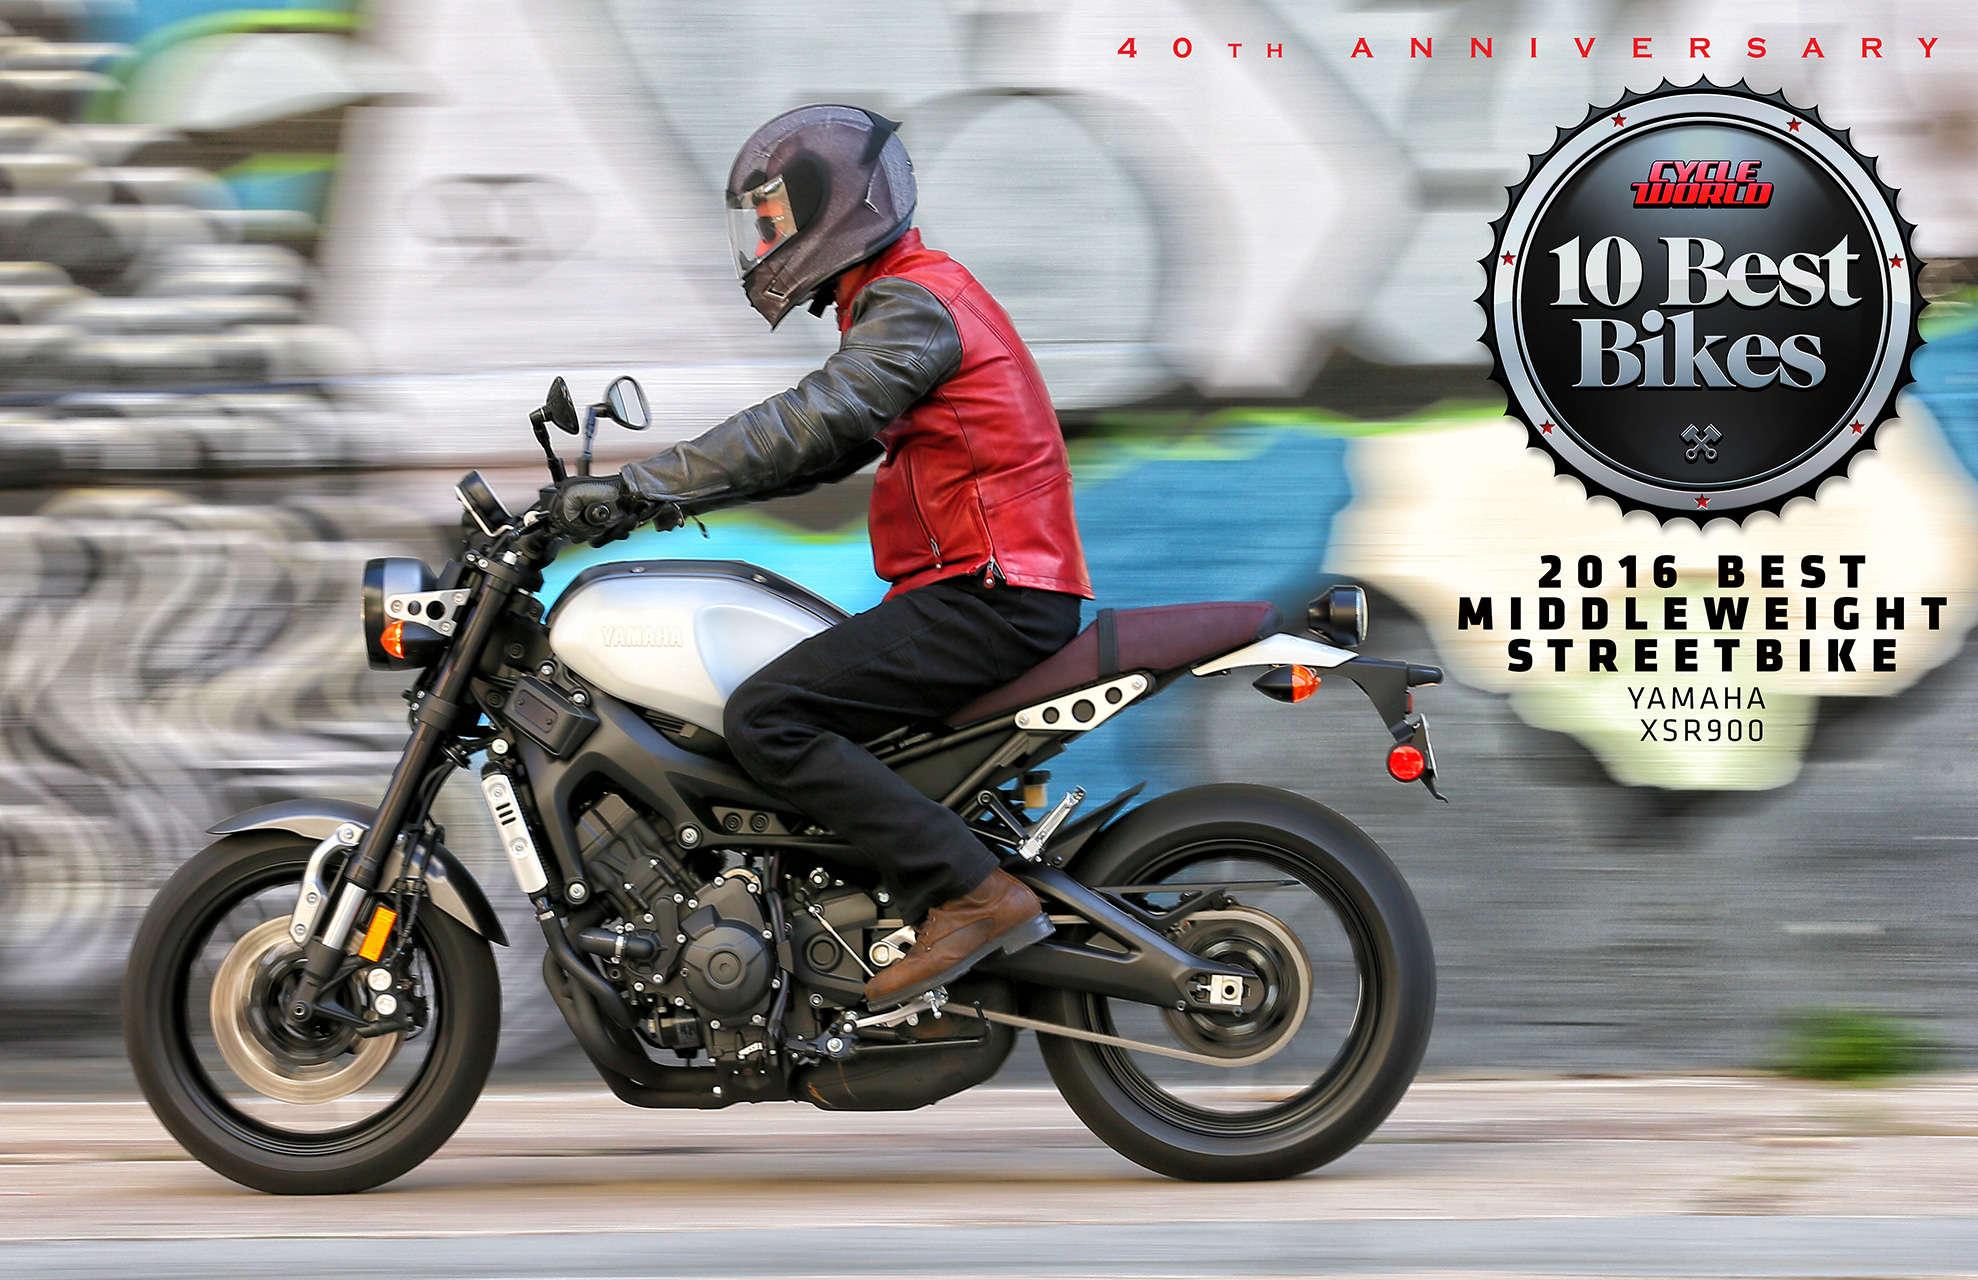 Best middleweight streetbike yamaha xsr900 business for Yamaha motor finance usa login